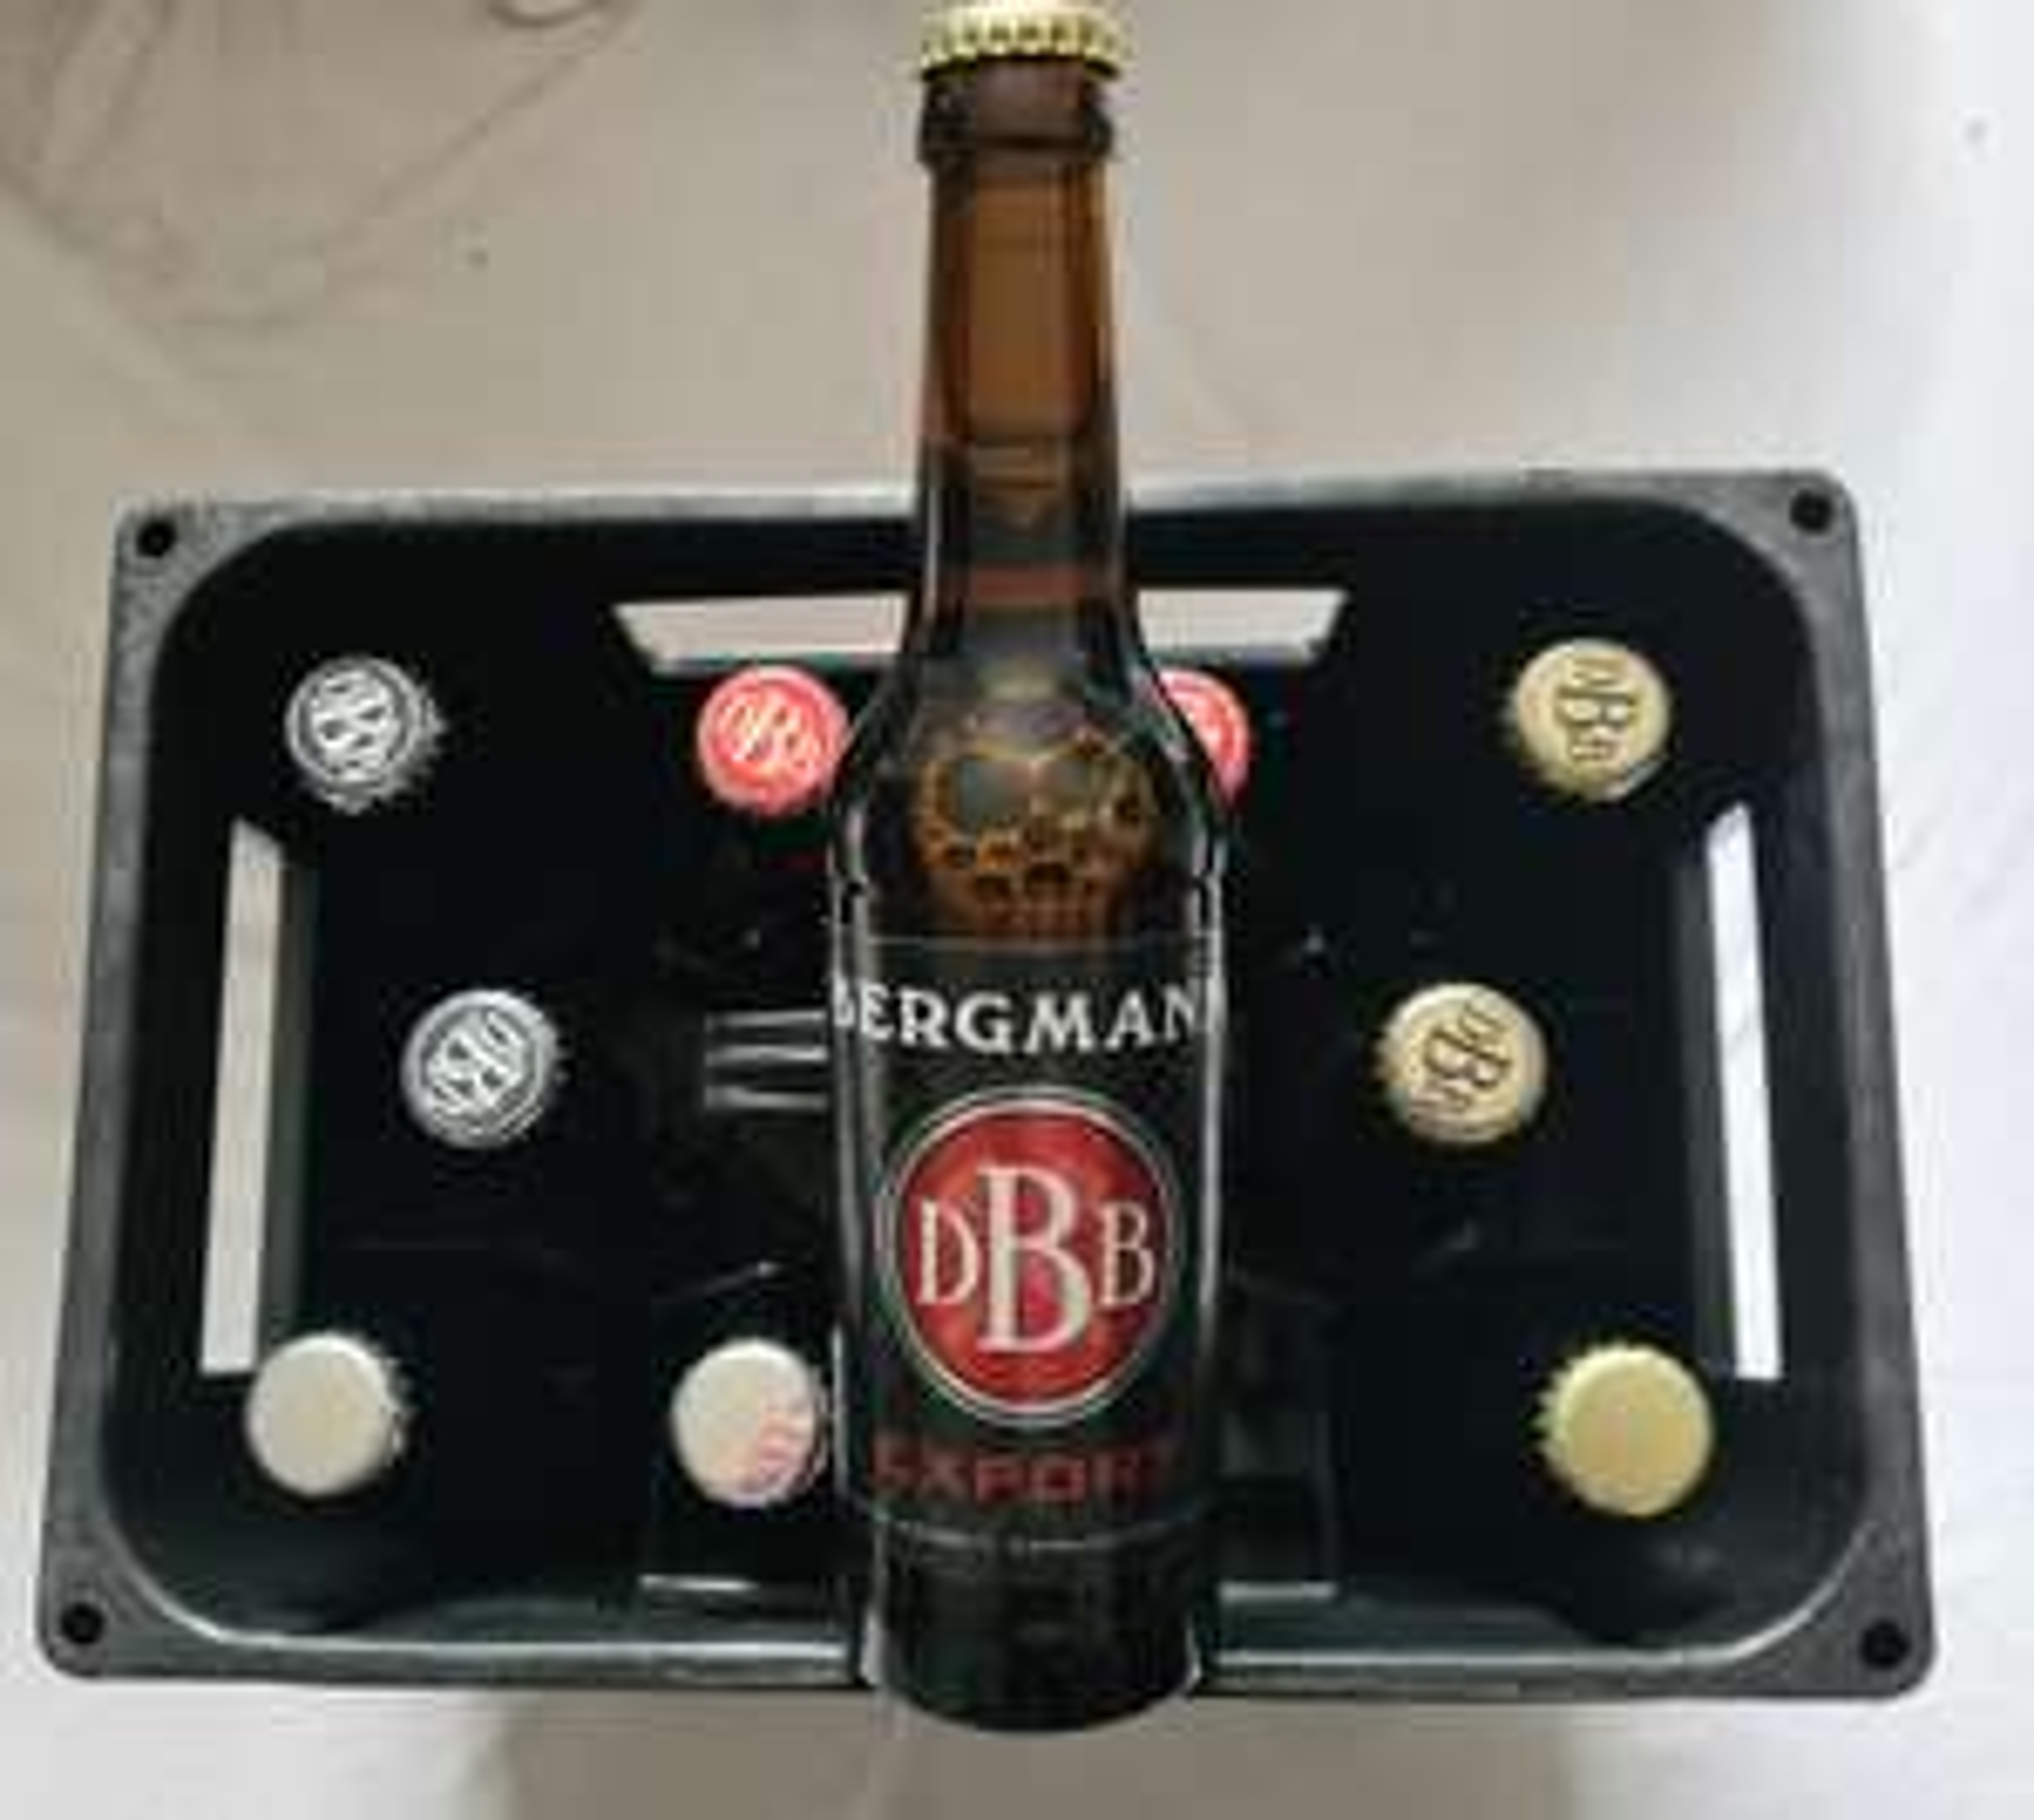 Bergmann Bier 0,33l | 10er Kasten Klassiker frei wählbar [Lokal REWE Dortmund (ggf. Regional?)]